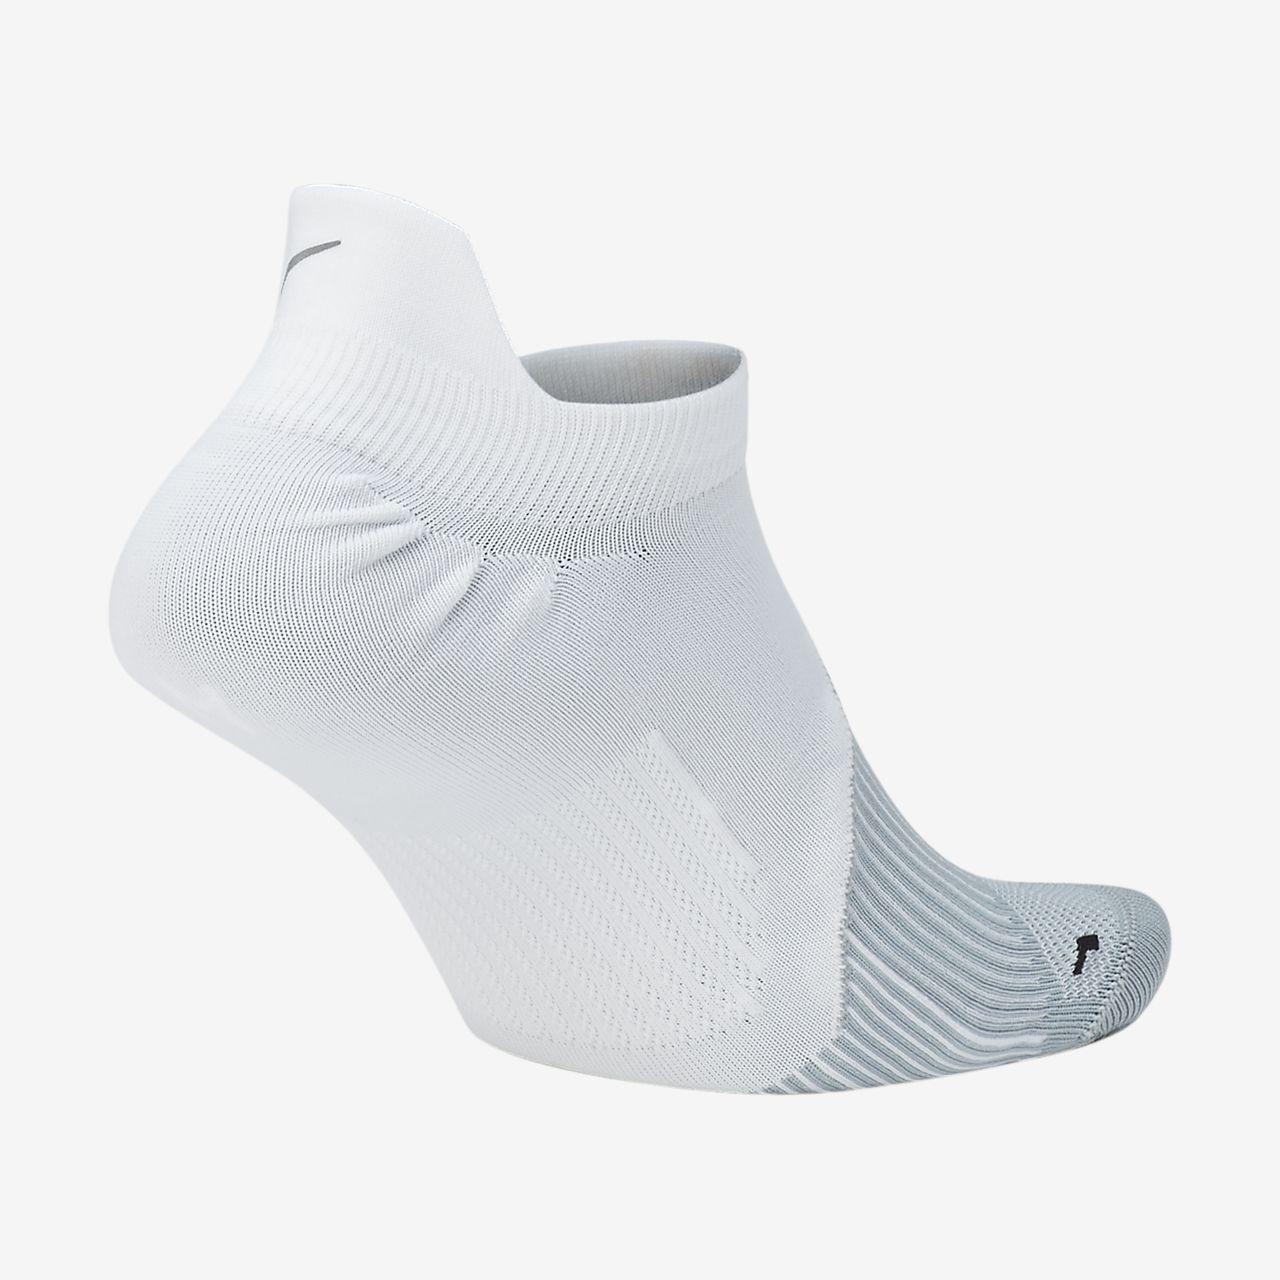 Běžecké ponožky Nike Elite Lightweight No-Show